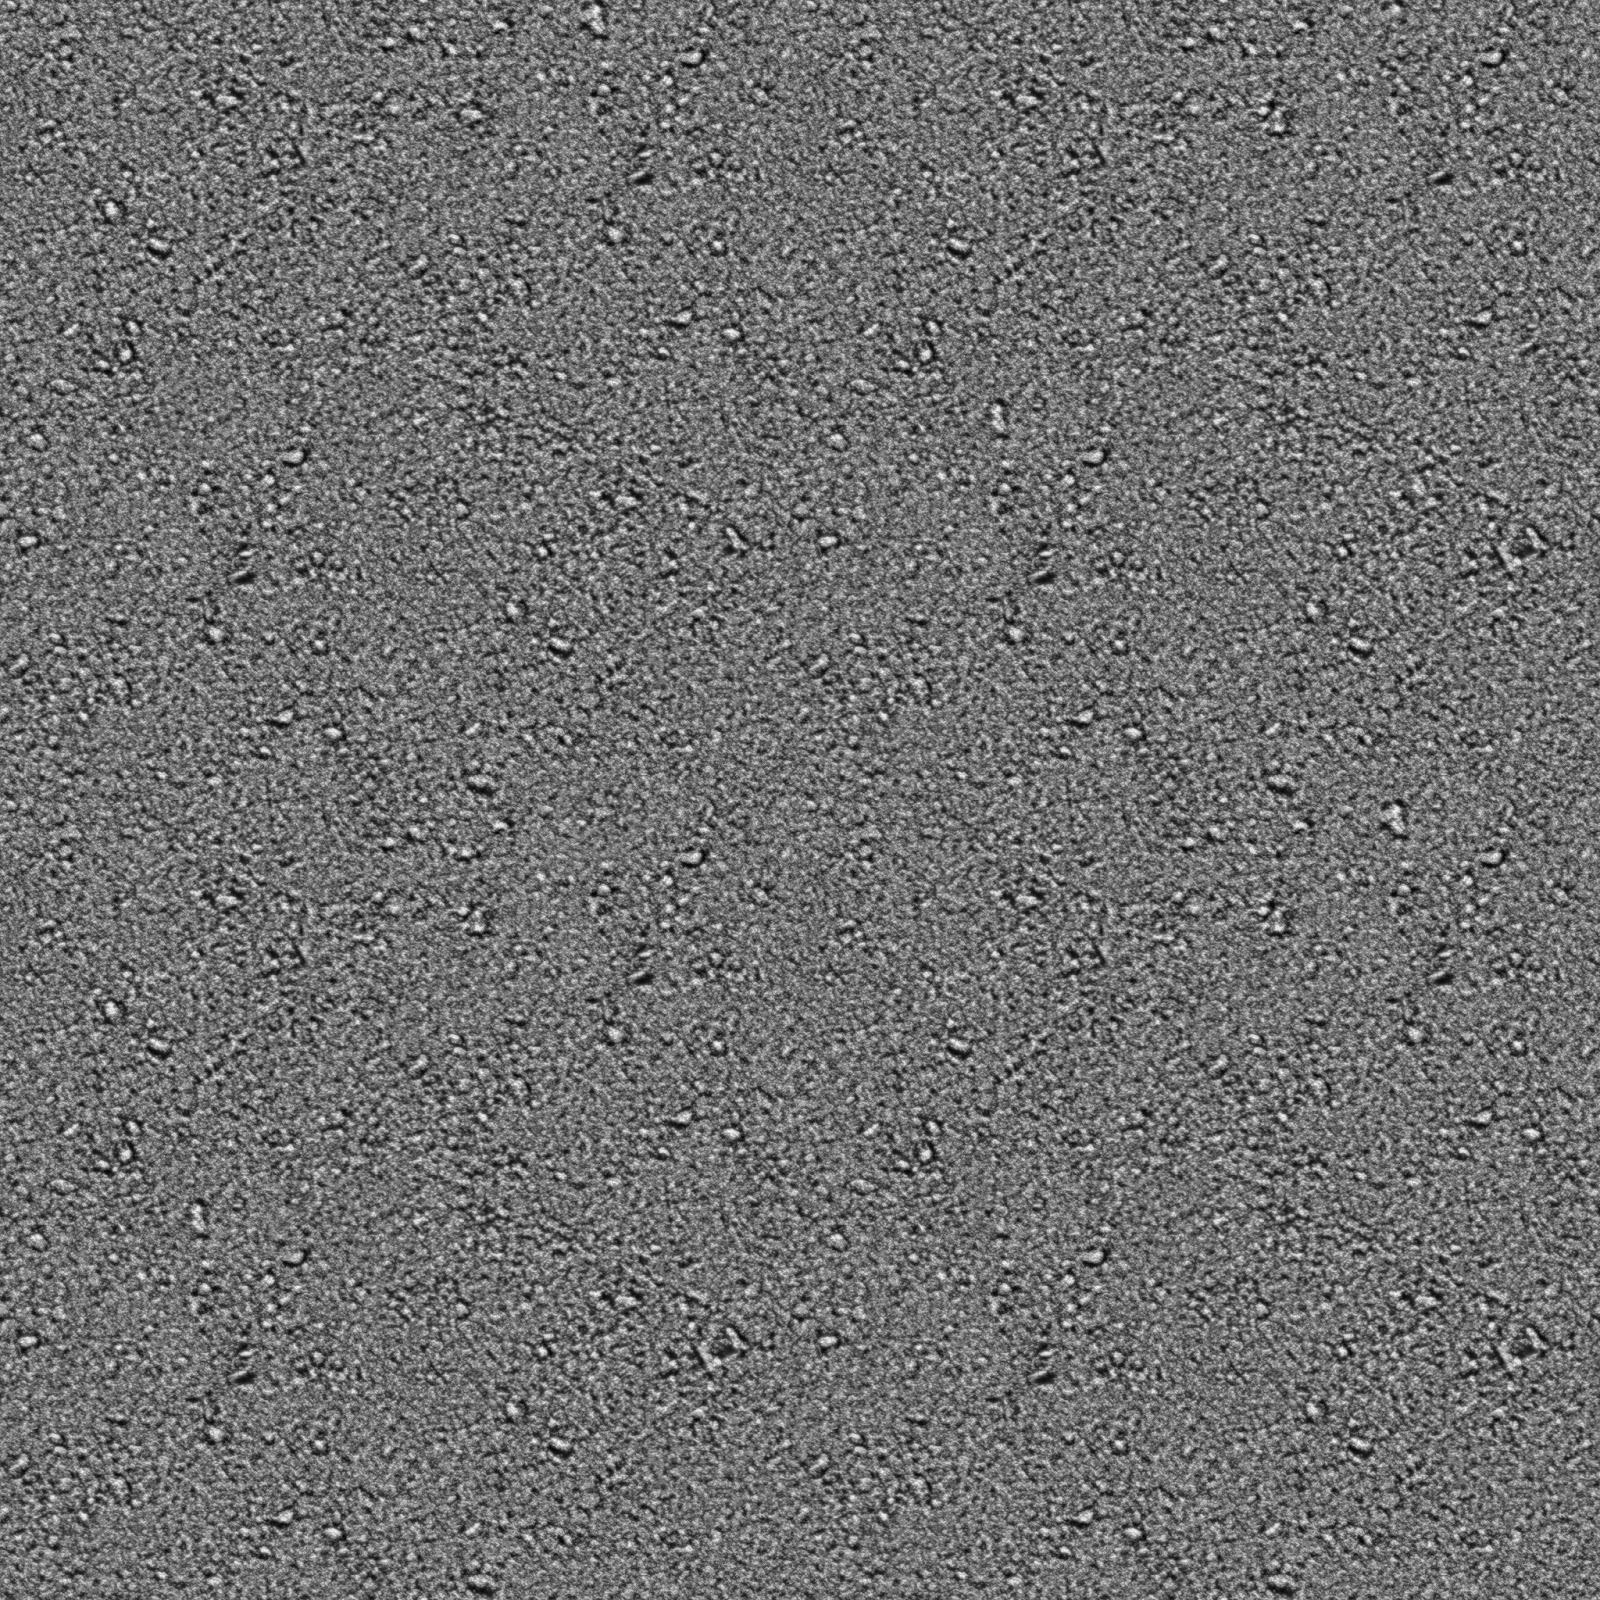 Seamless Tarmac Asphalt Texture + (Maps)   Texturise Free ...